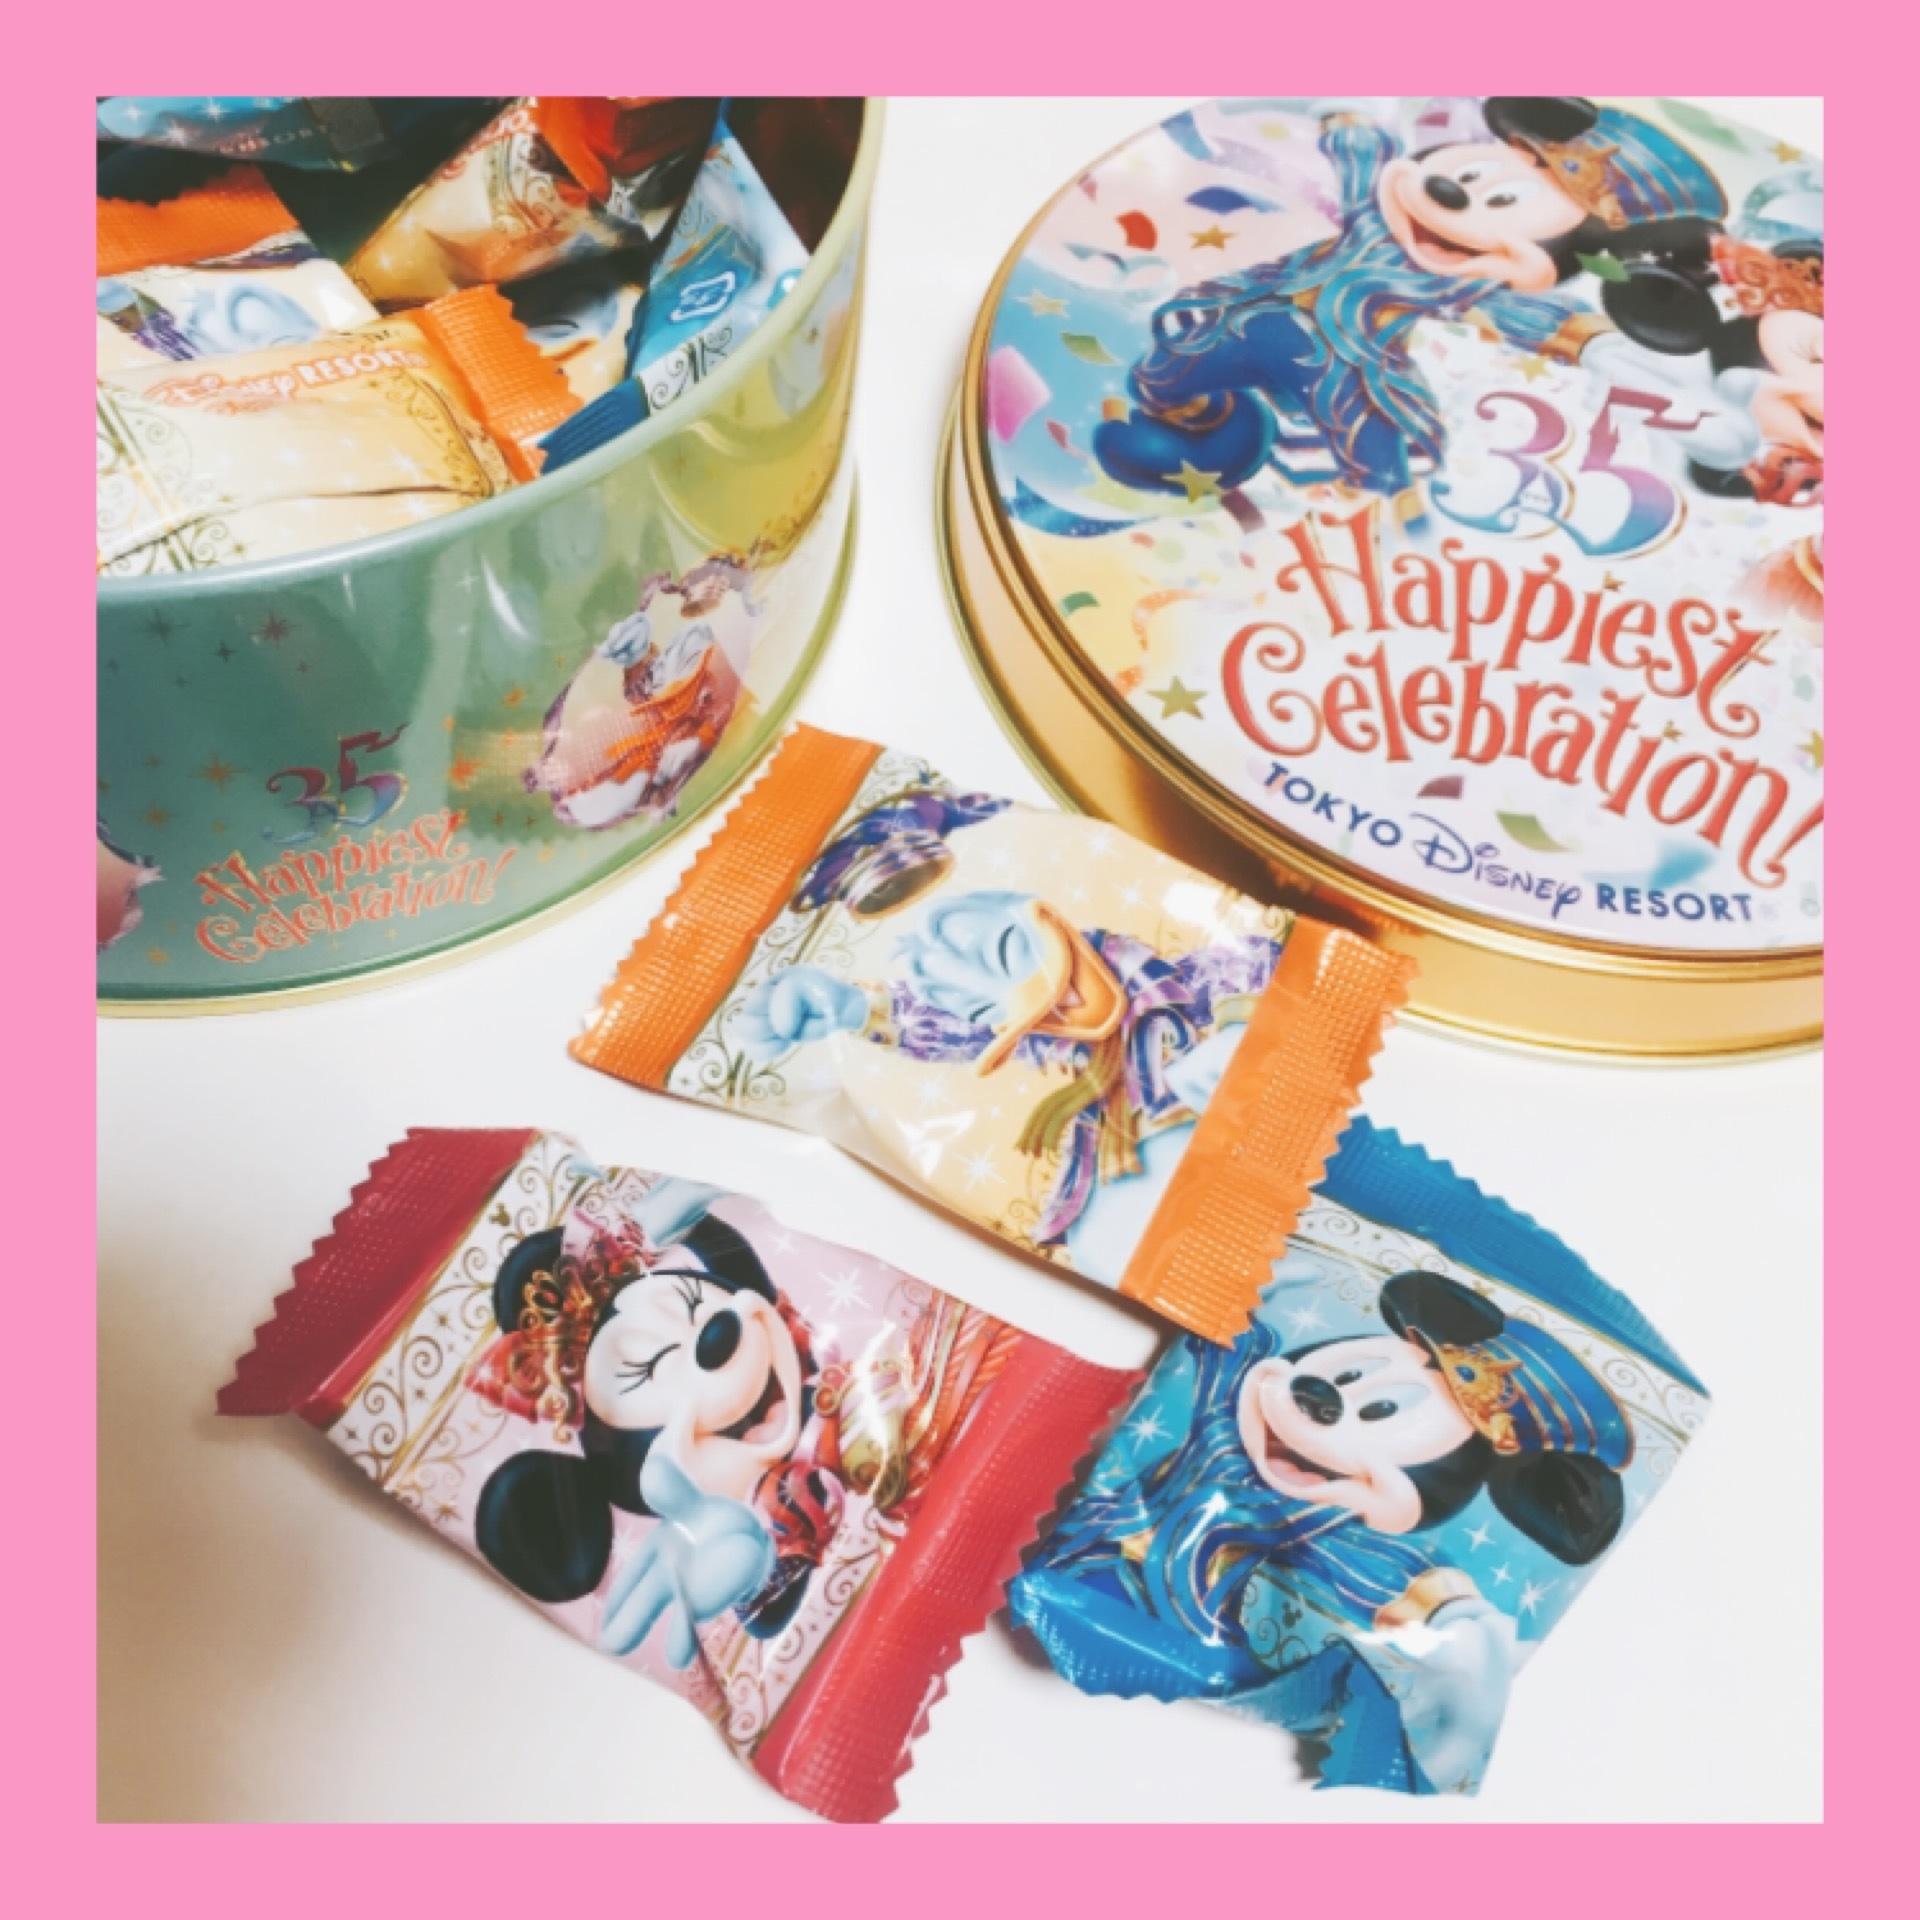 Tokyo Disneyland《 35 Happiest Gelebration! 》お土産編♫_1_6